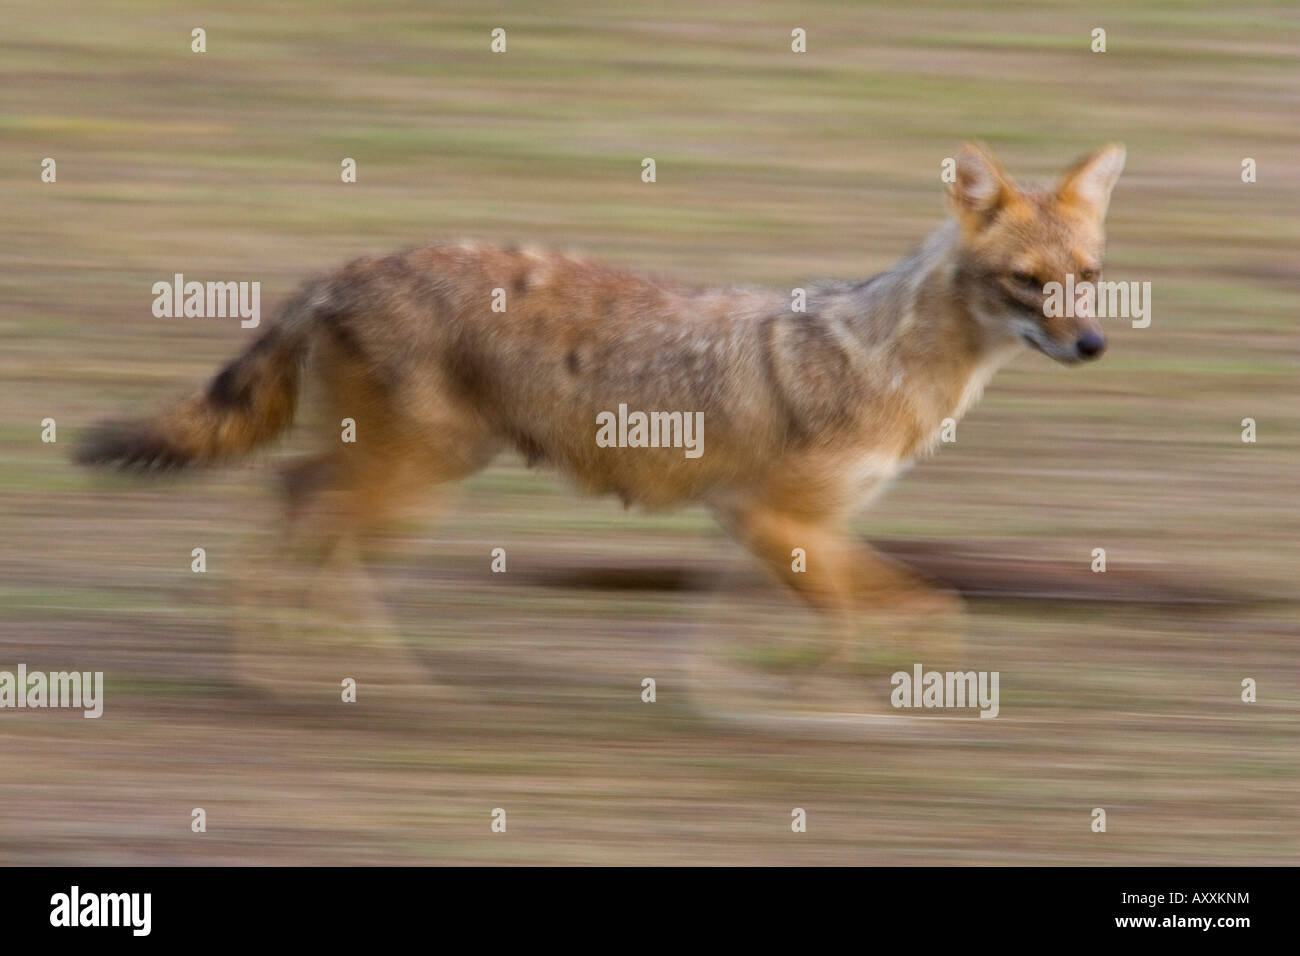 Indian Jackal, (Canis aureus), Bandhavgarh N.P., Madhya Pradesh, India - Stock Image